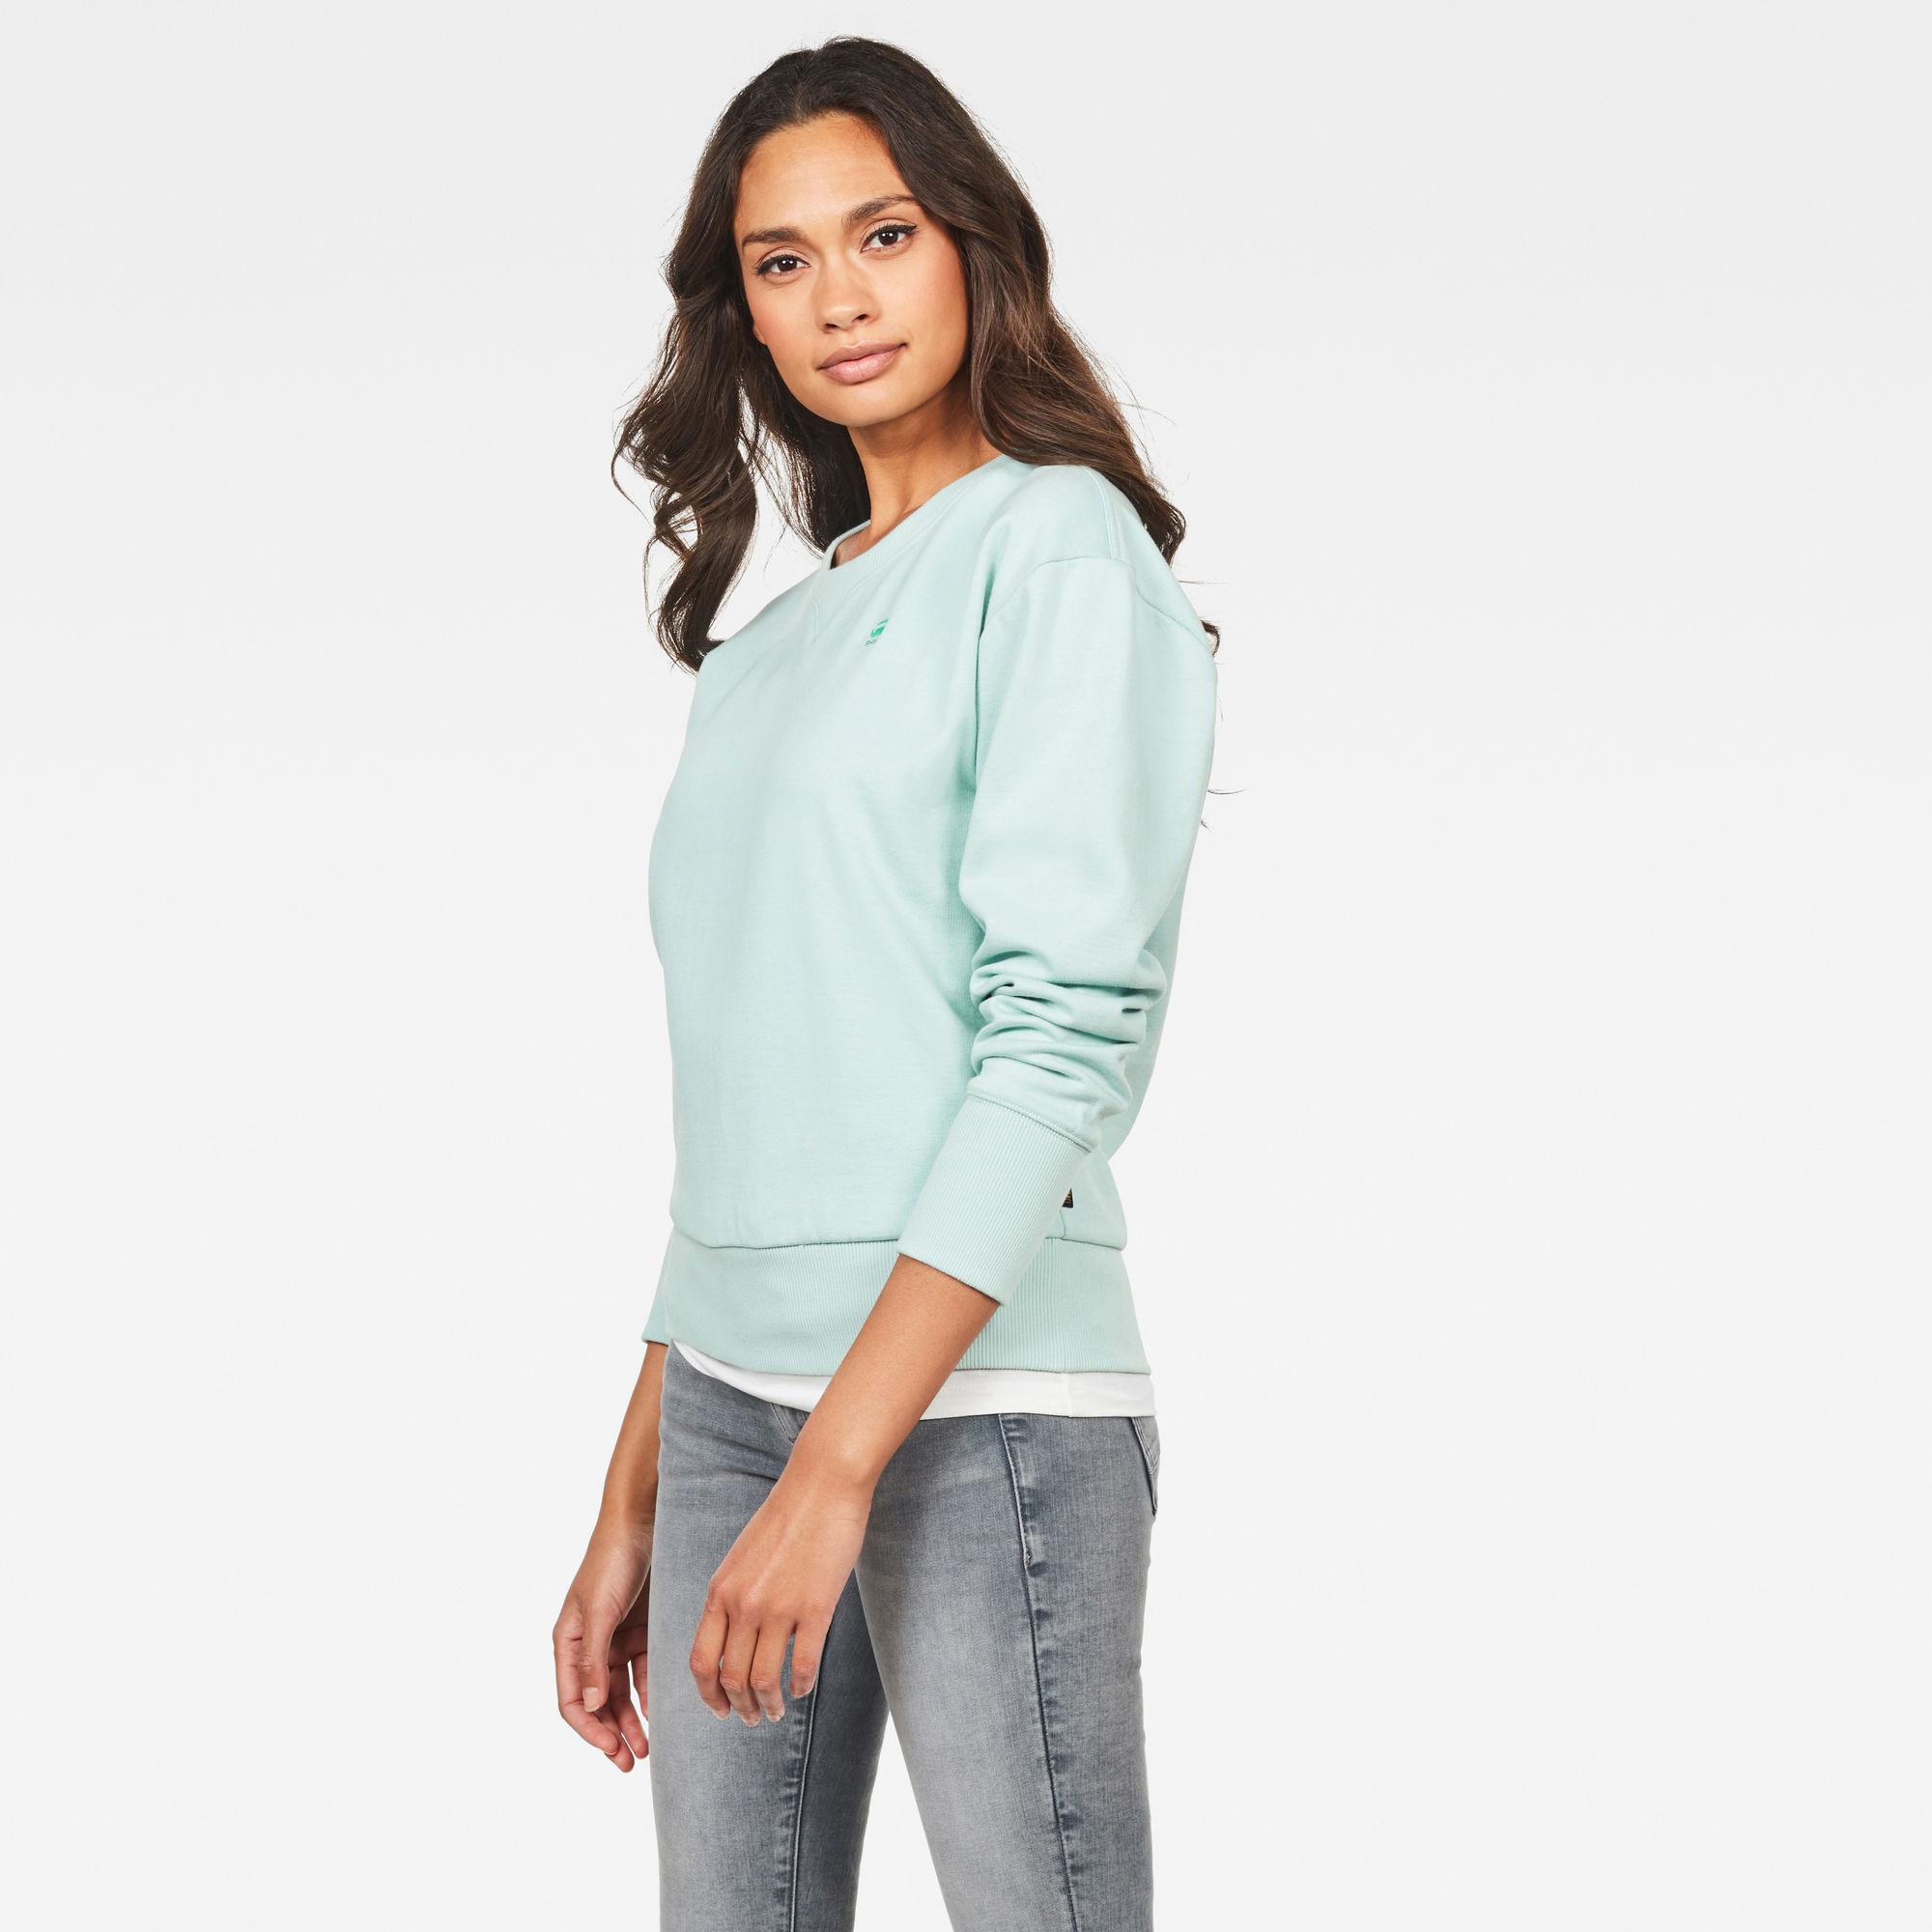 Xzyph 2-Tone Sweater